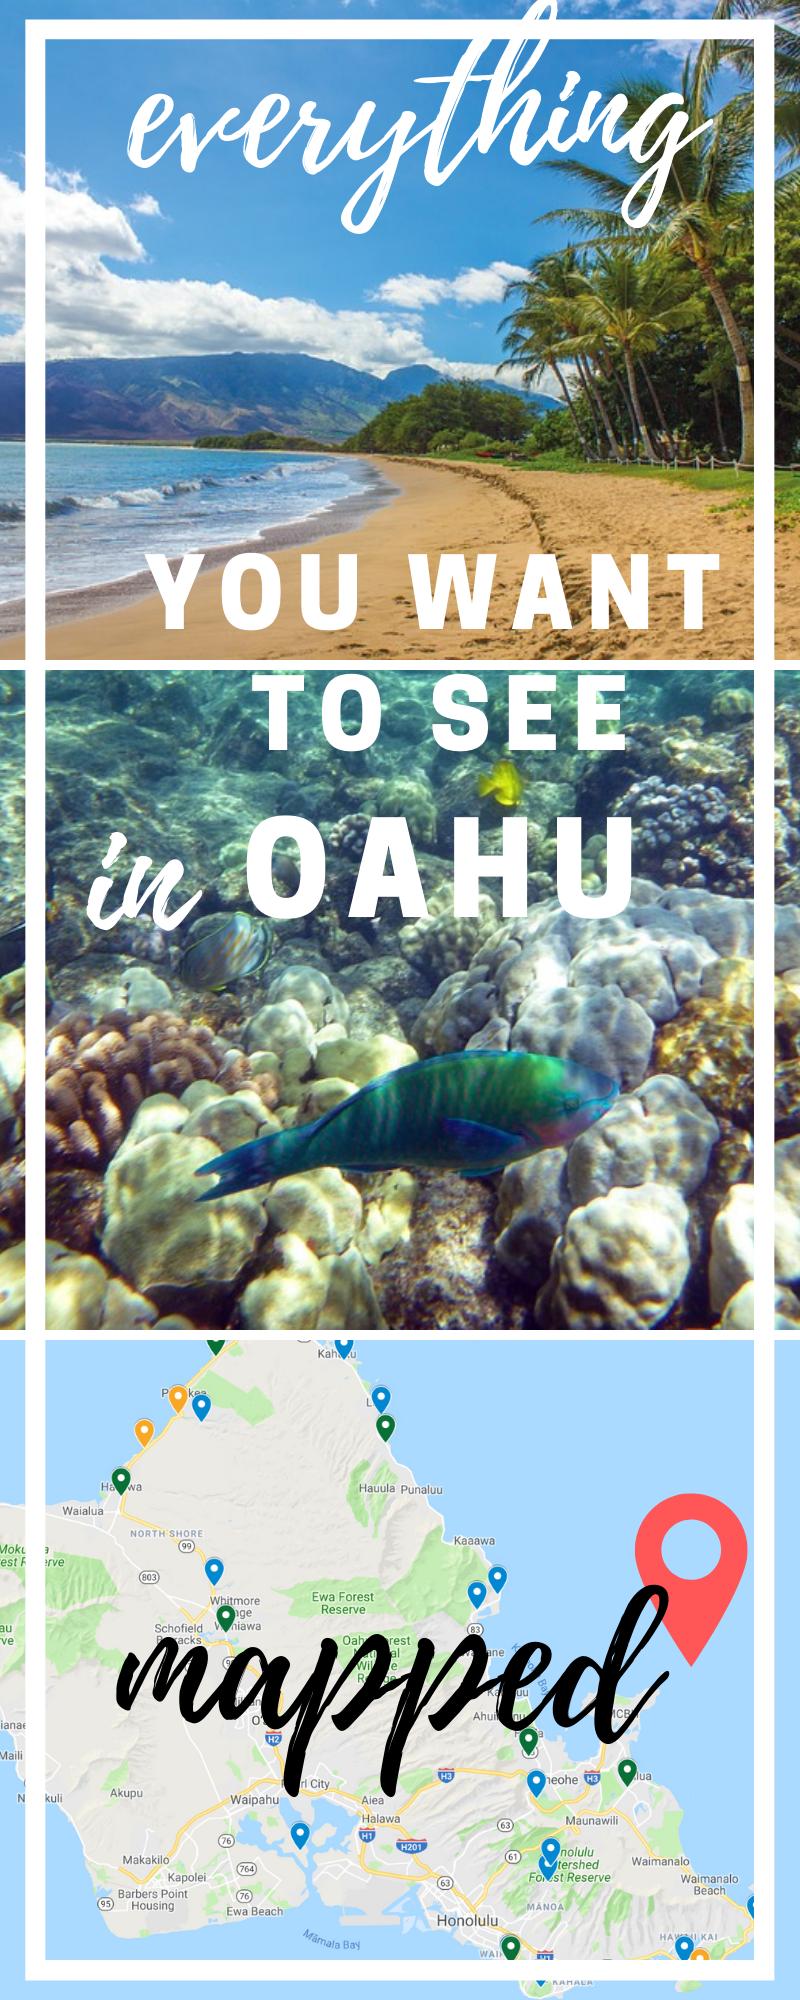 valentina Oahu travel, Oahu hawaii map, Hawaii beaches